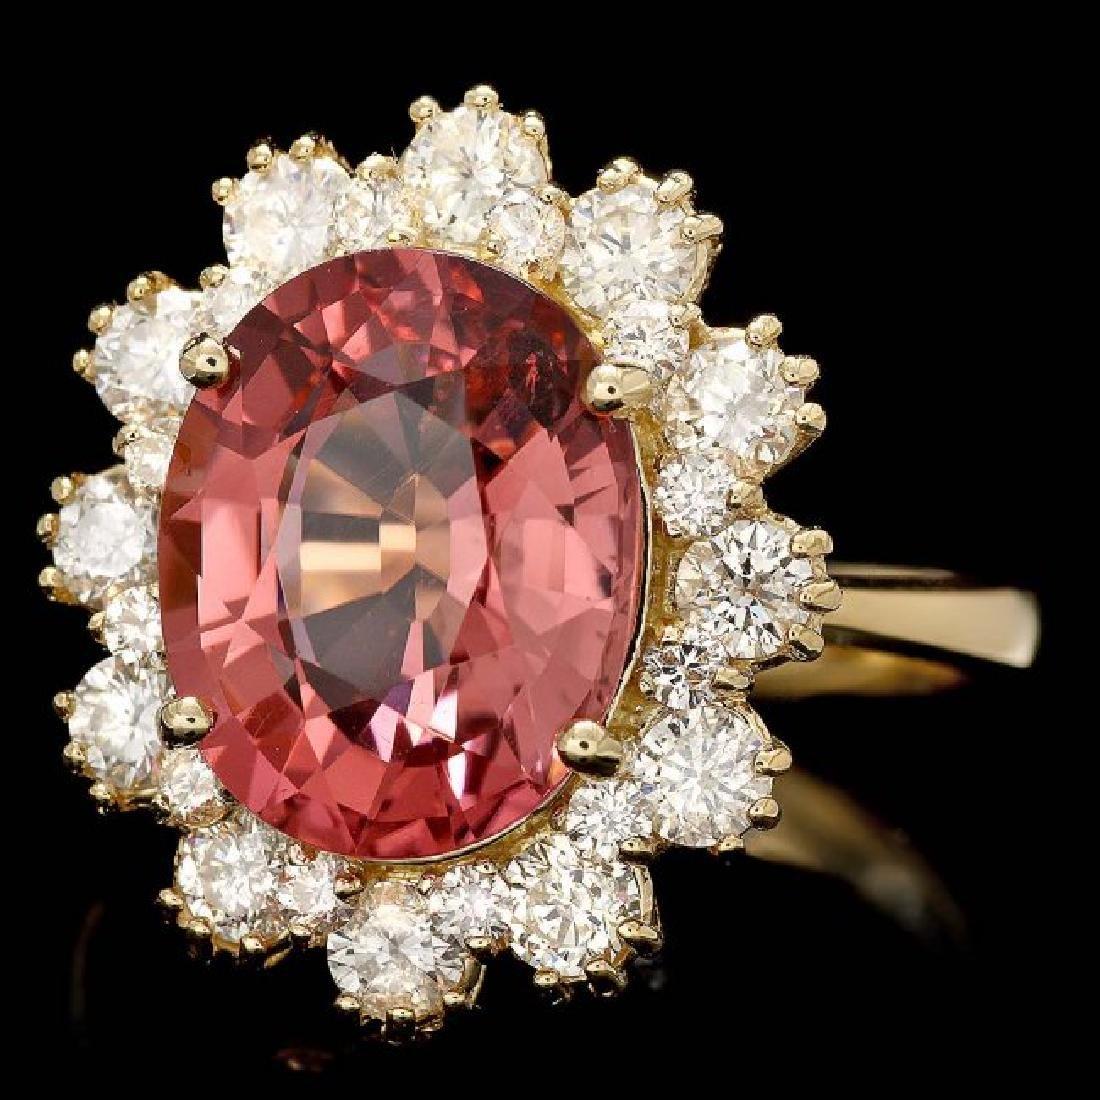 14k Gold 5ct Tourmaline 1.20ct Diamond Ring